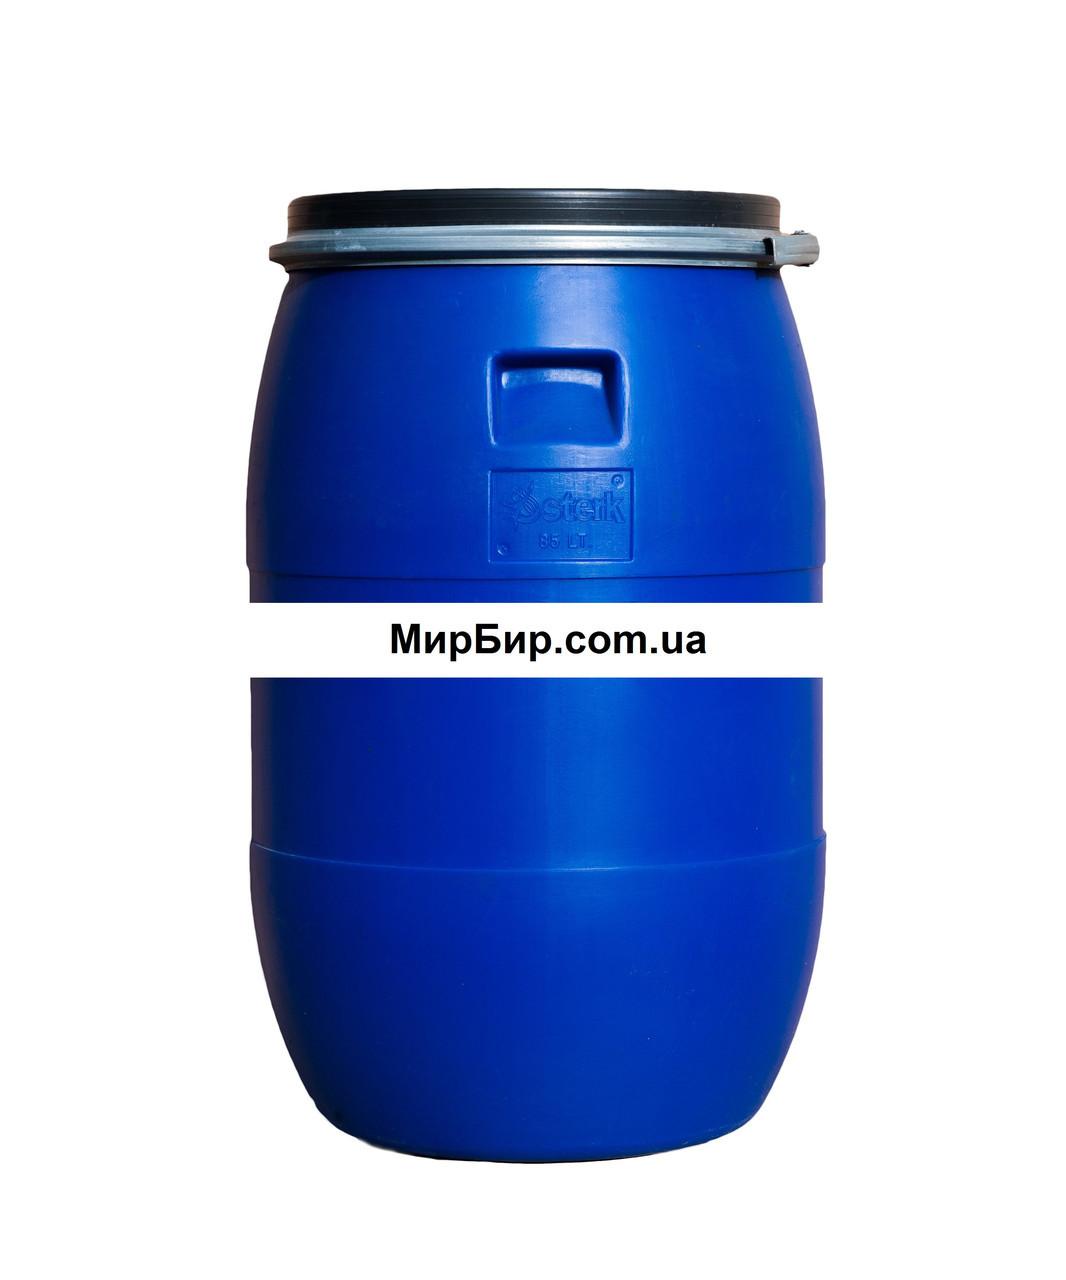 Бочка с зажимом, 85 литров